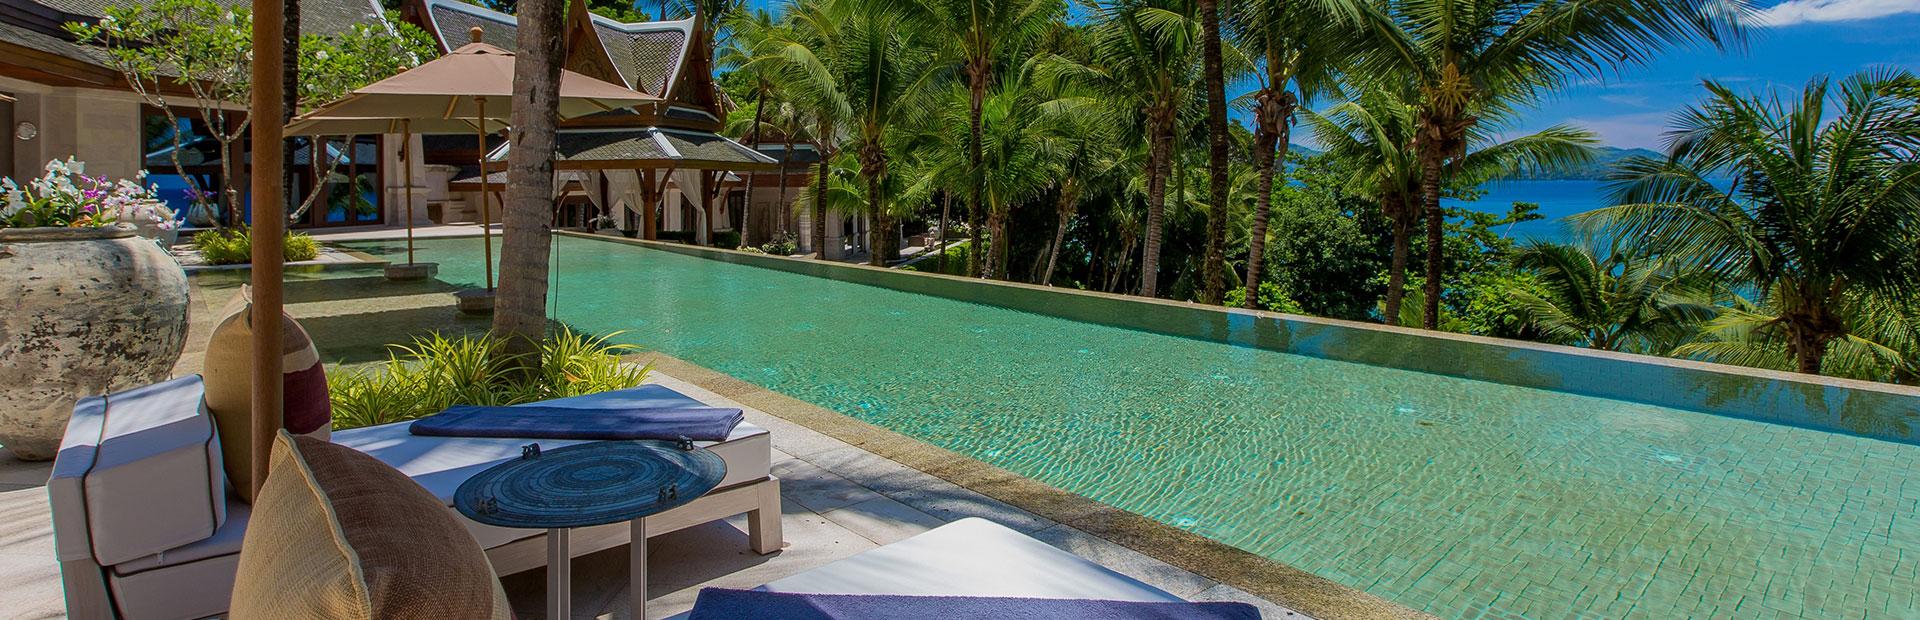 See Stunning Oceanfront Luxury Villa - SOLD details